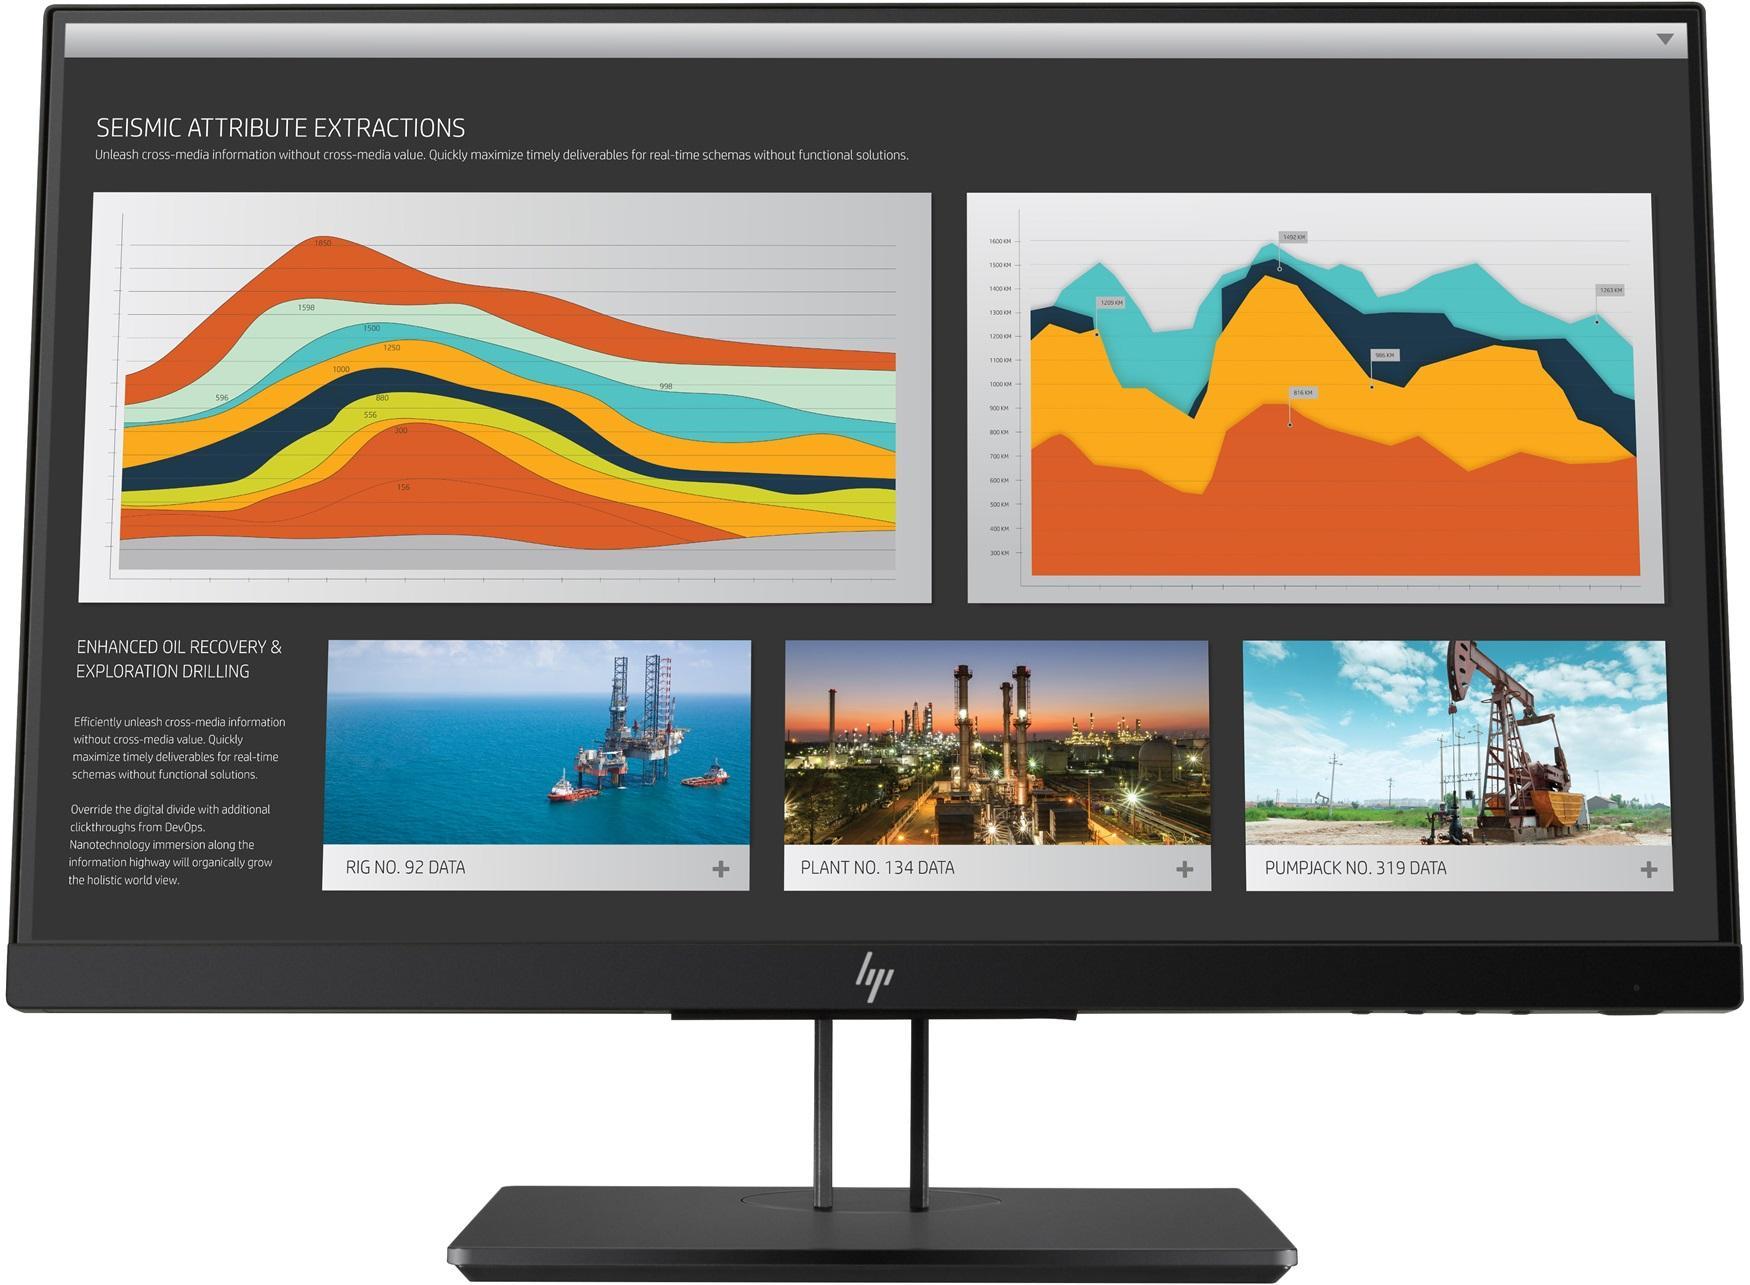 HP Z22n G2 21 5inch 16:9 IPS Monitor DisplayPort / HMDI / VGA Inputs New in  box / 90 Days Warranty Singapore